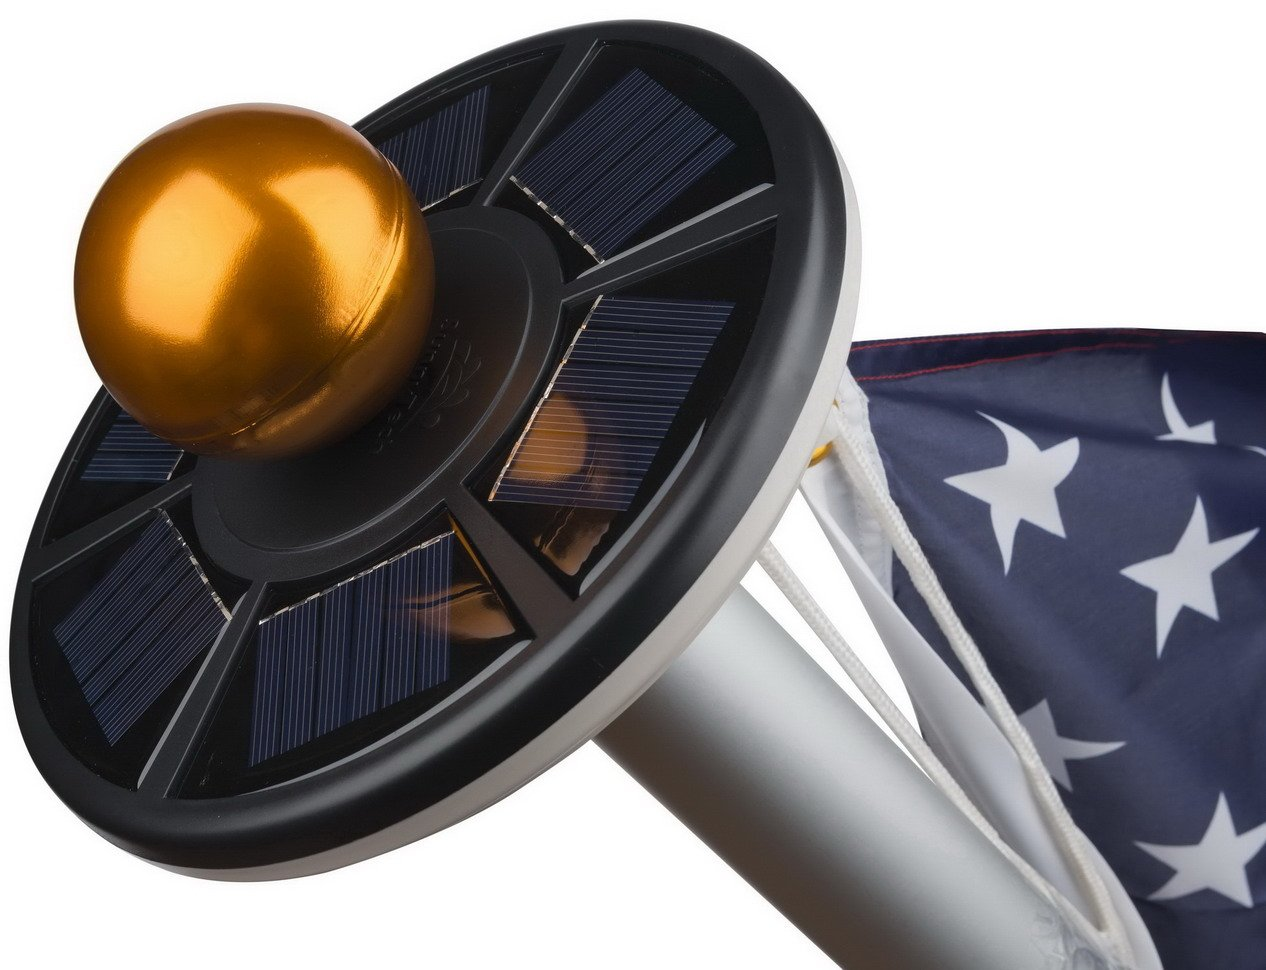 Sunnytech 2nd Generation Solar Flag Pole 20led Light,Brightest, Longest Lasting & Most Flag Coverage, Downlight Lights up Flag on Most 15 to 25 Ft Flagpole for Night Lighting White+Black Shell